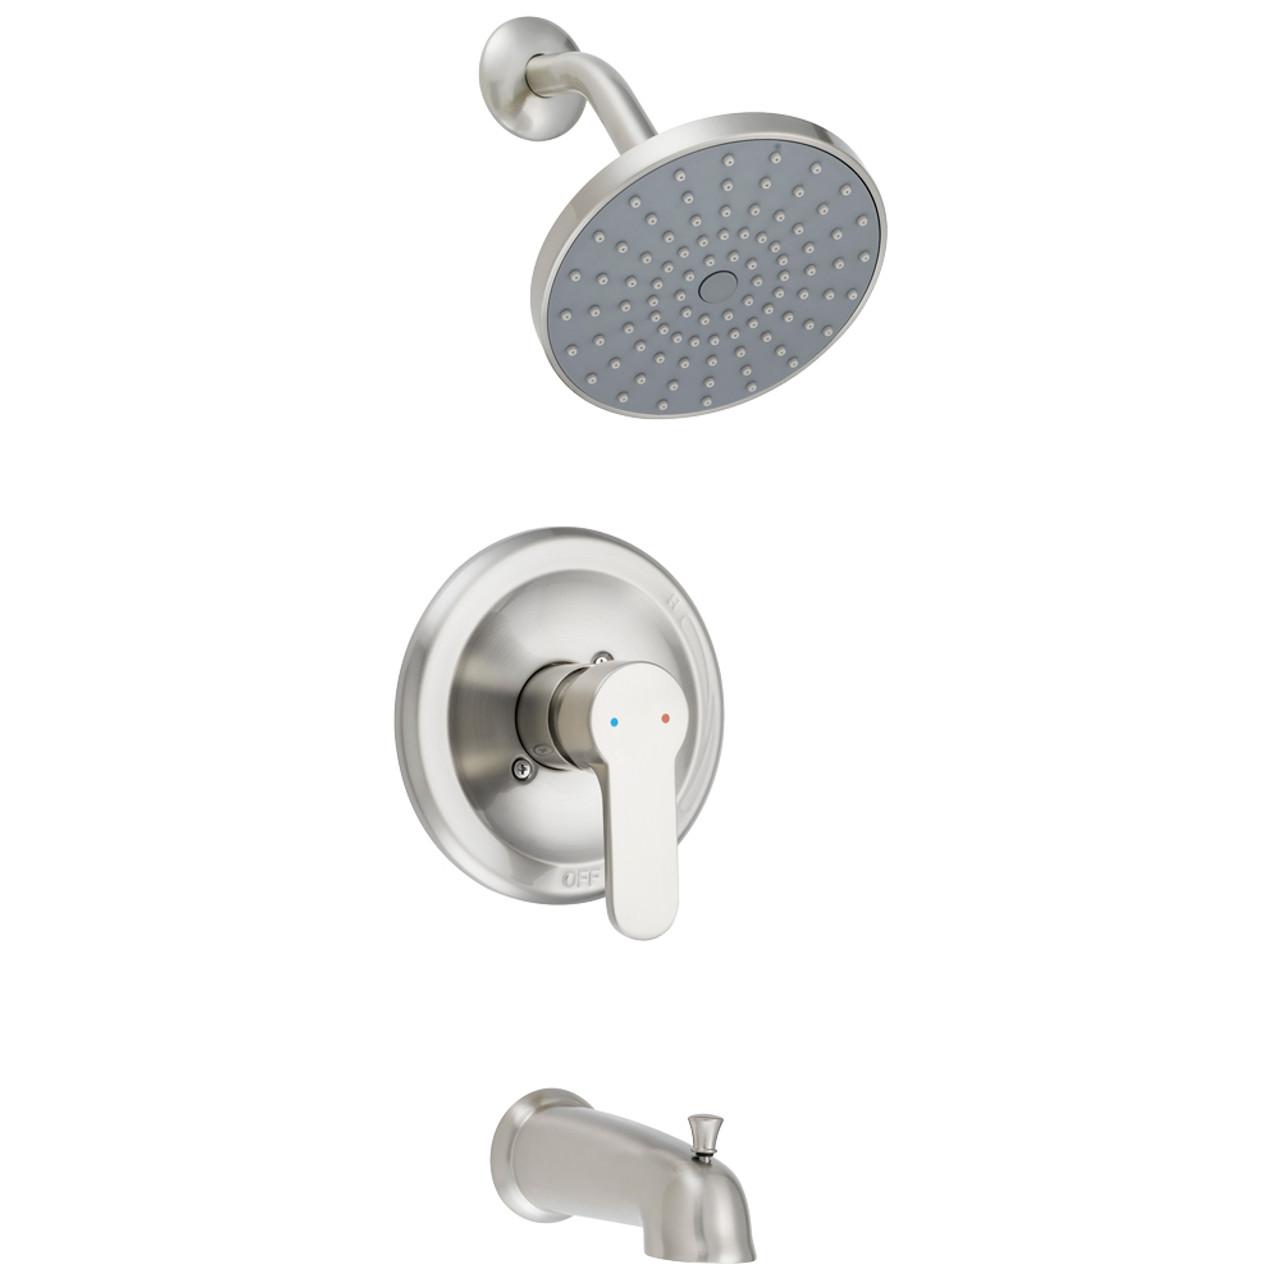 Designers Impressions 615717 Satin Nickel Single Handle Tub / Shower ...